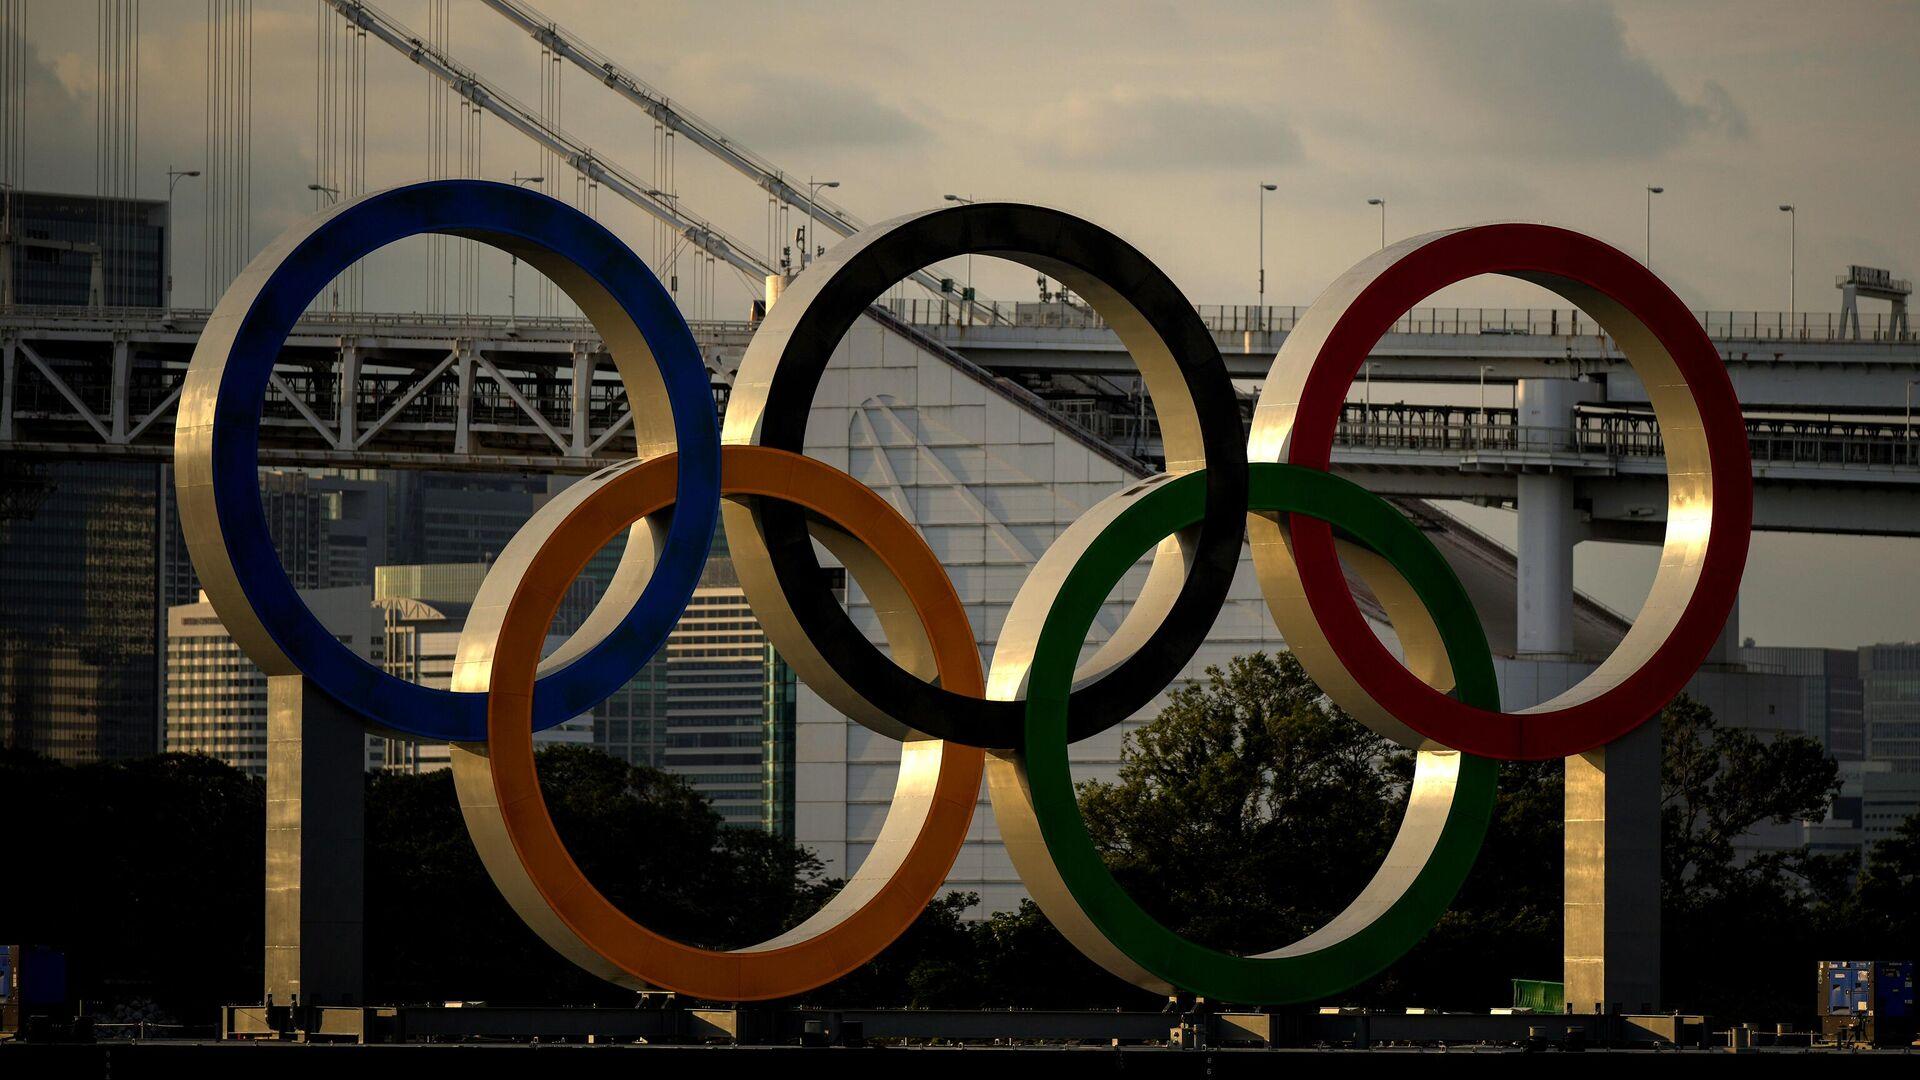 Токио накануне открытия Олимпийских игр - РИА Новости, 1920, 24.07.2021